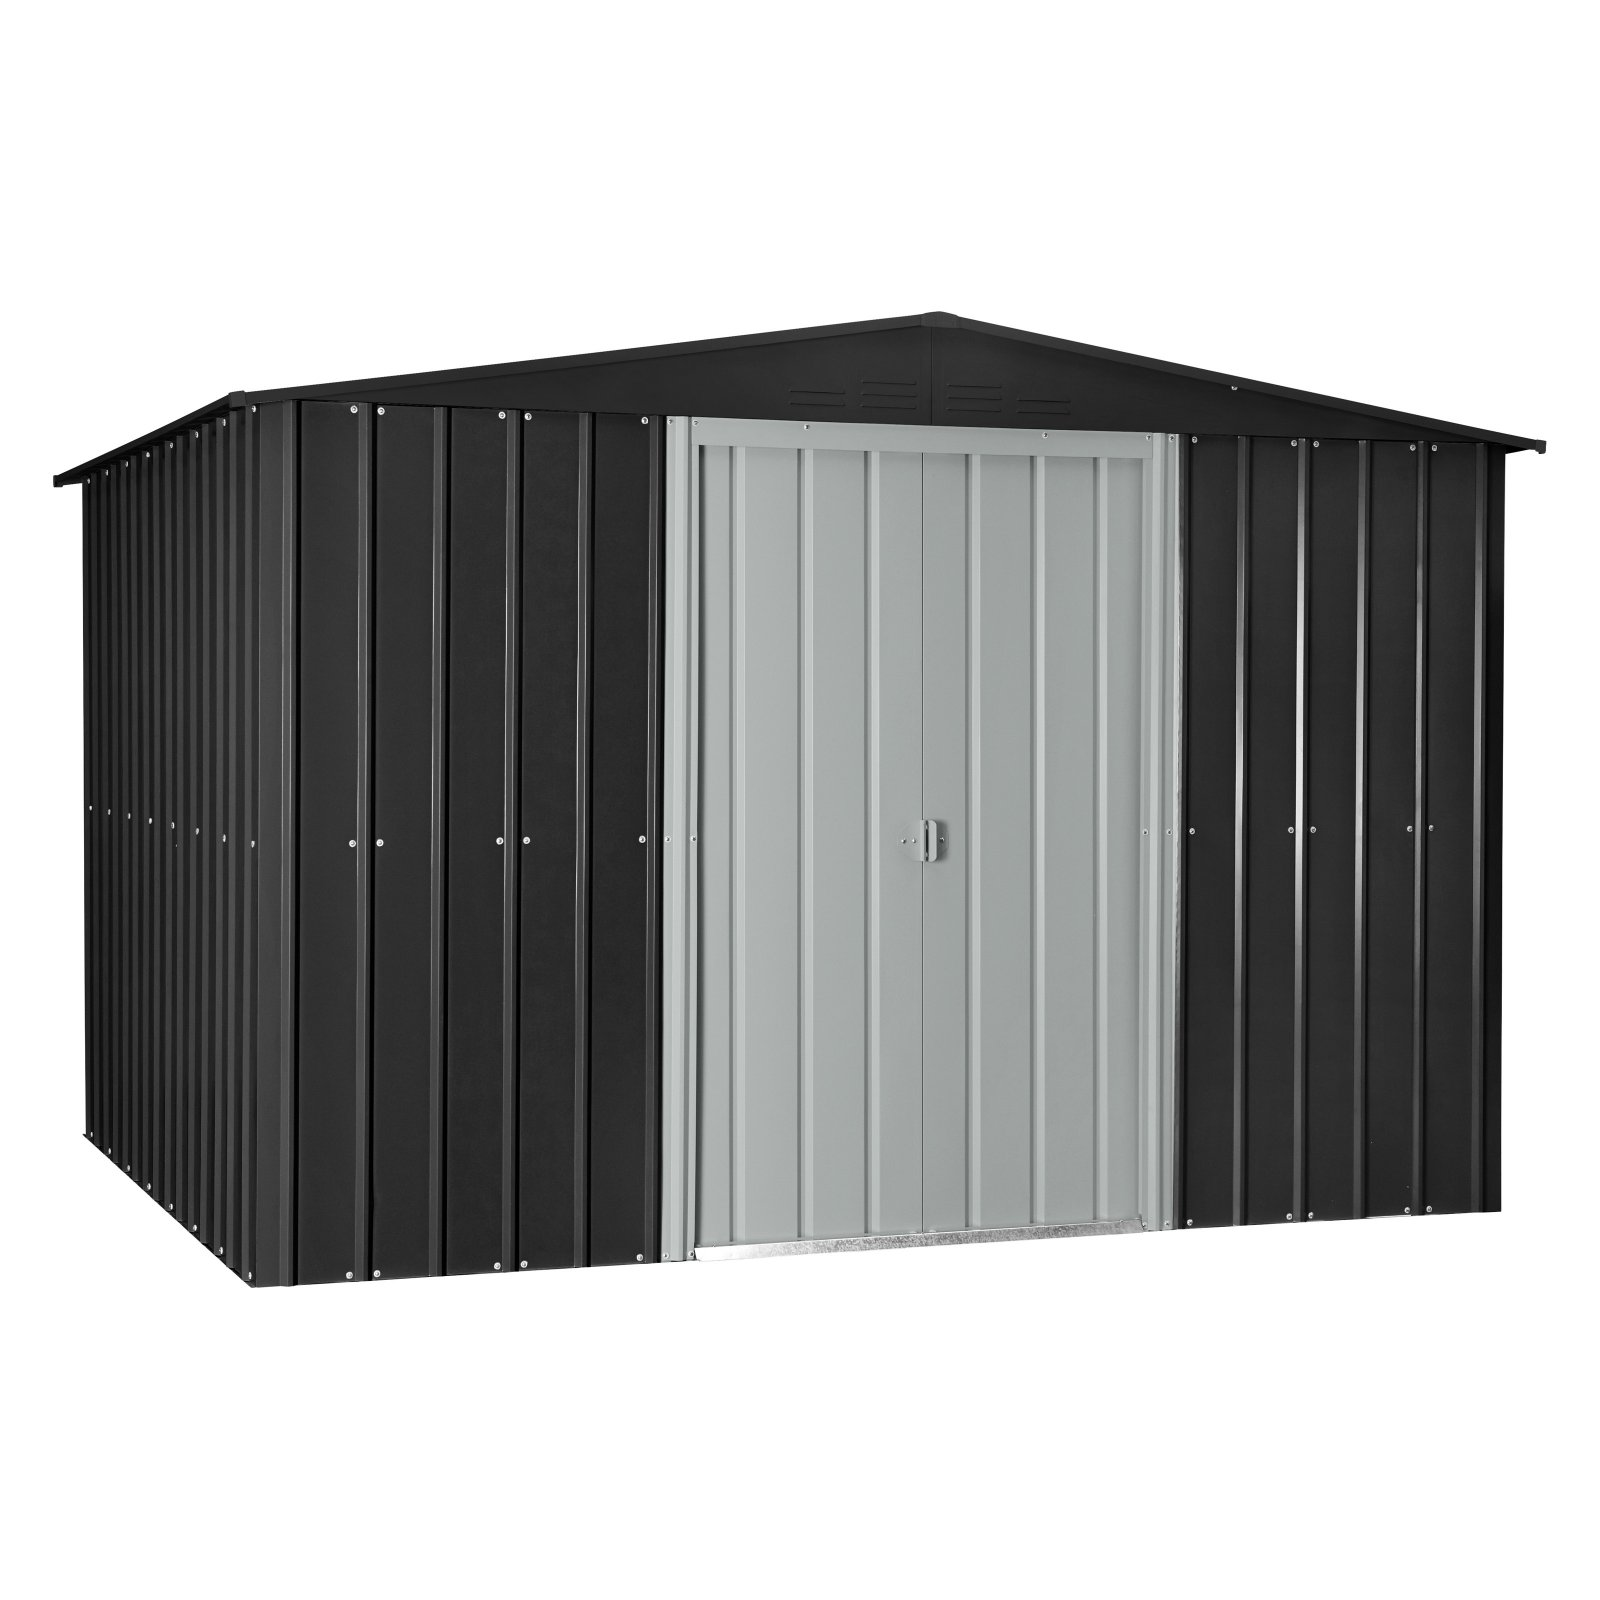 Globel 10'x8' Gable Roof Metal Storage Shed